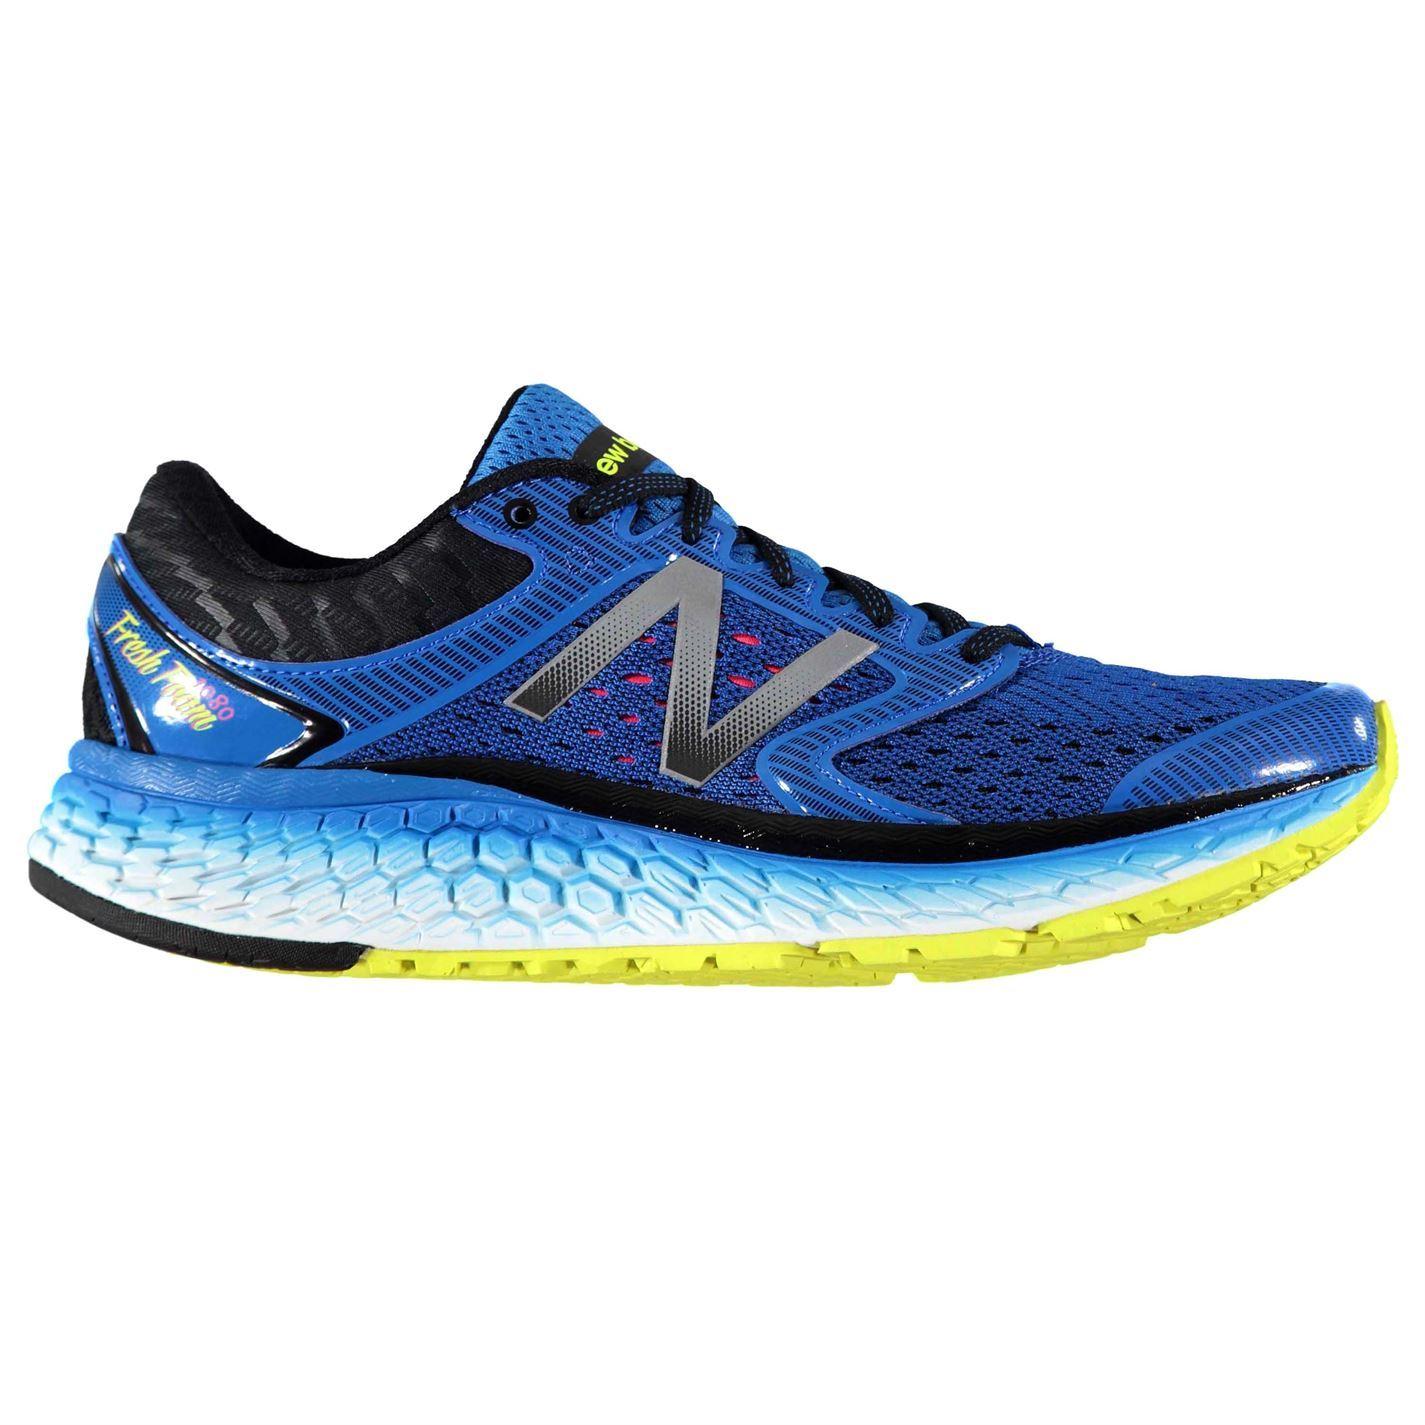 Ebay New Balance Running Shoes